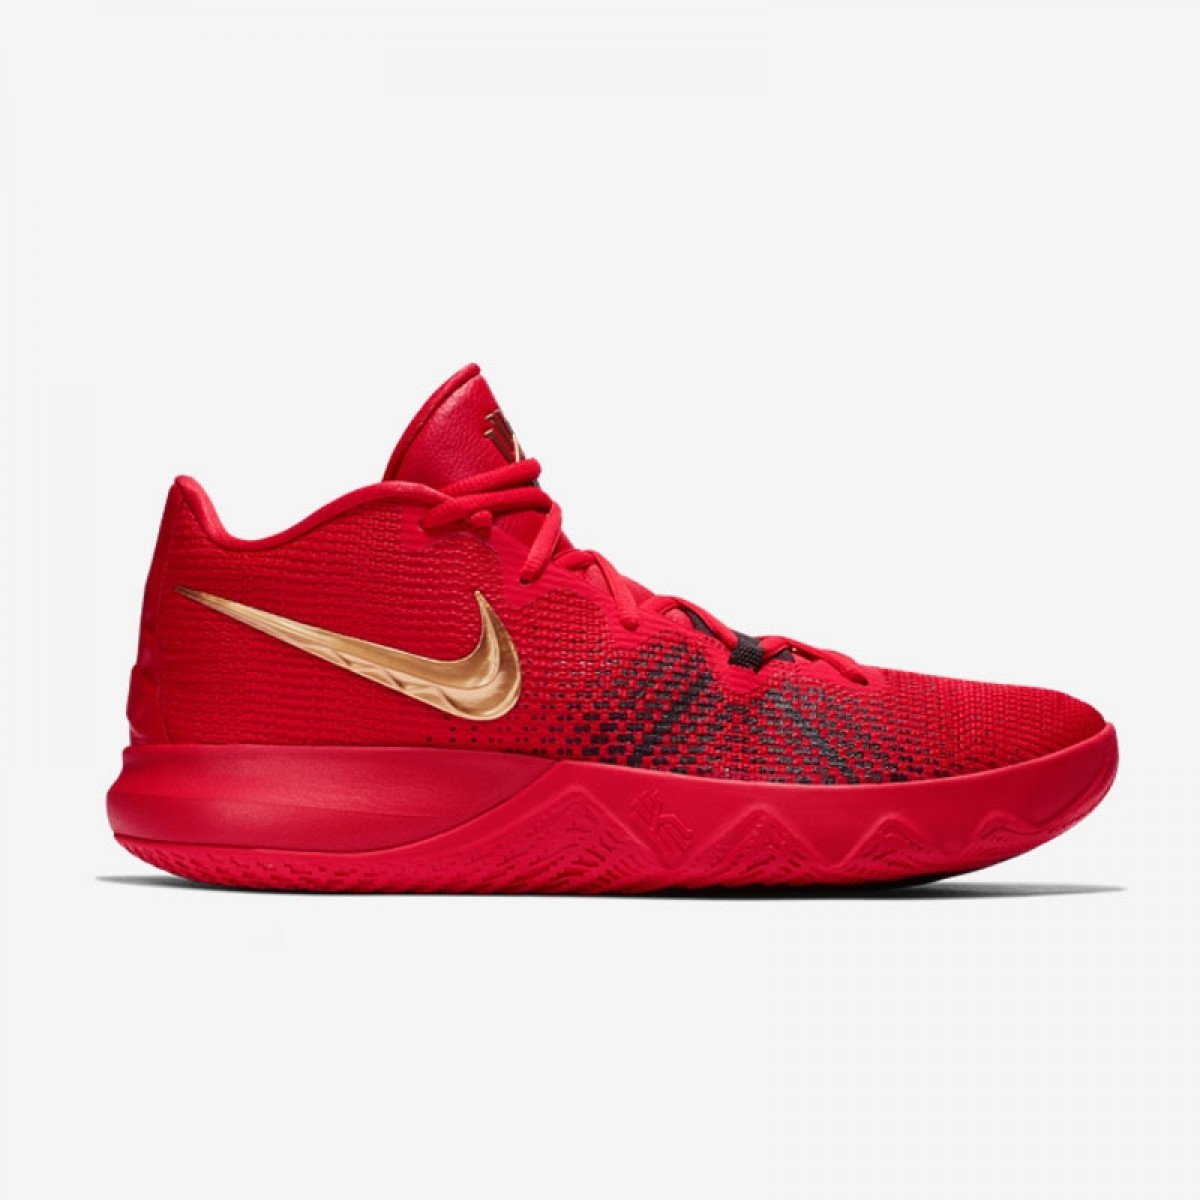 Nike Kyrie Flytrap 'Red October'